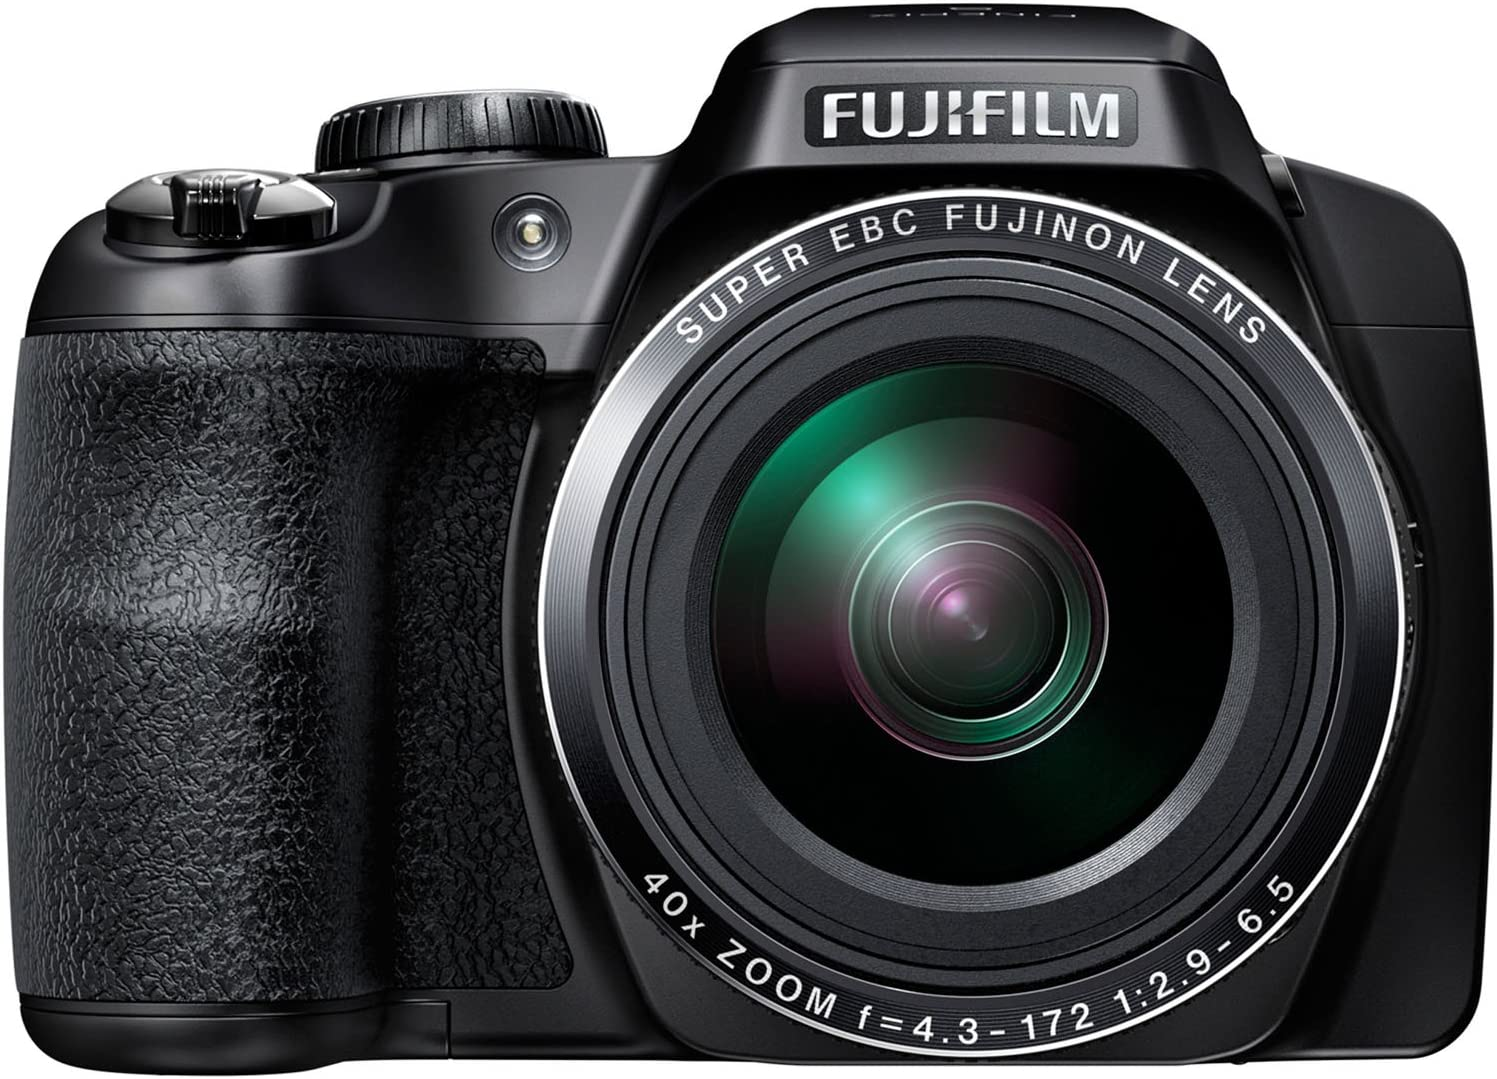 Fujifilm FinePix S8200 16.2MP Digital Camera with 3-Inch LCD (Bl